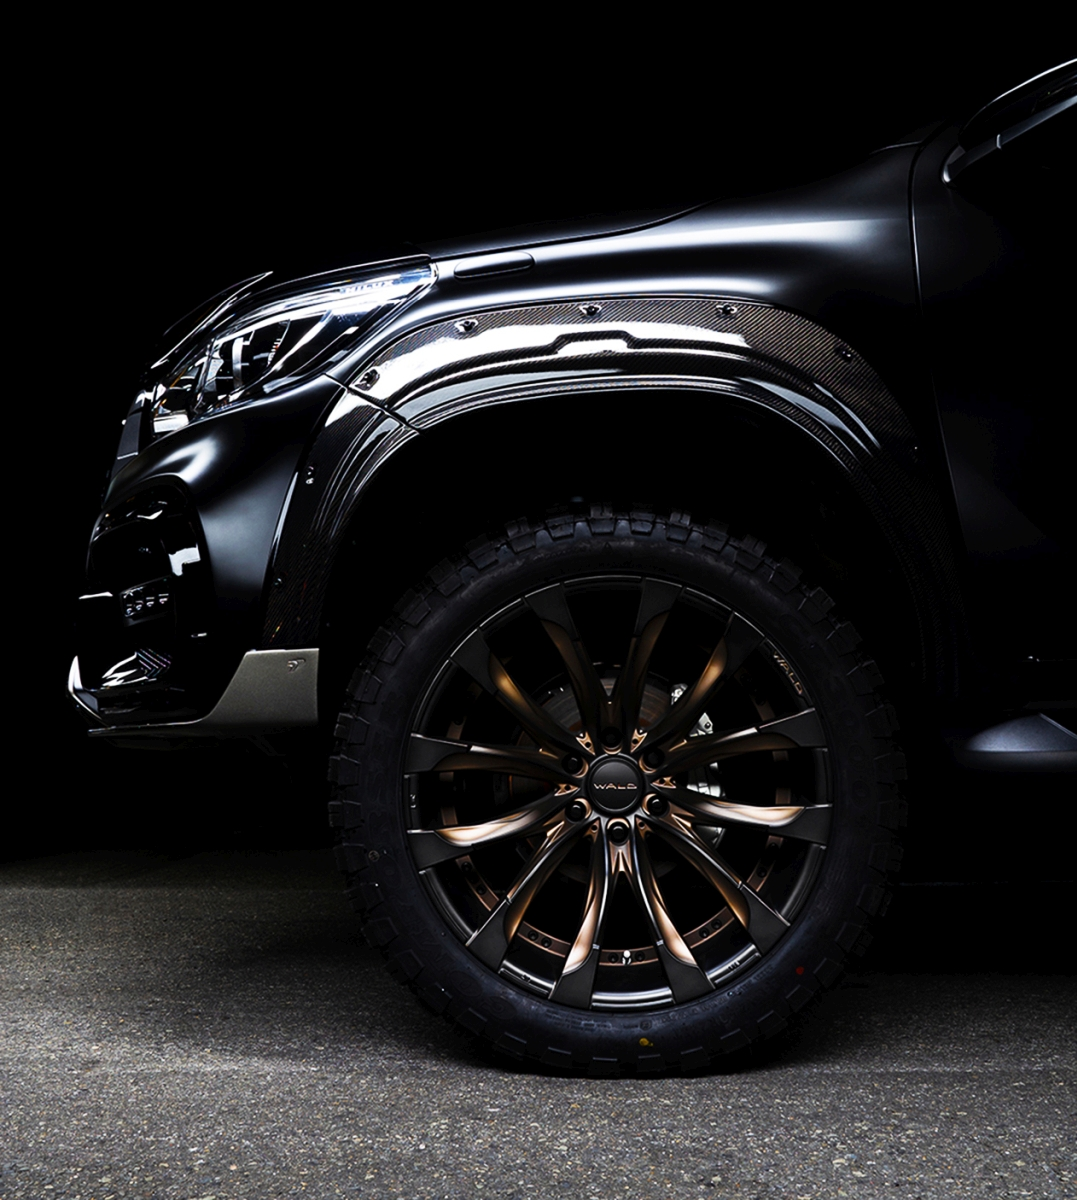 Wald Toyota Hilux Sports Line Black Bison Edition